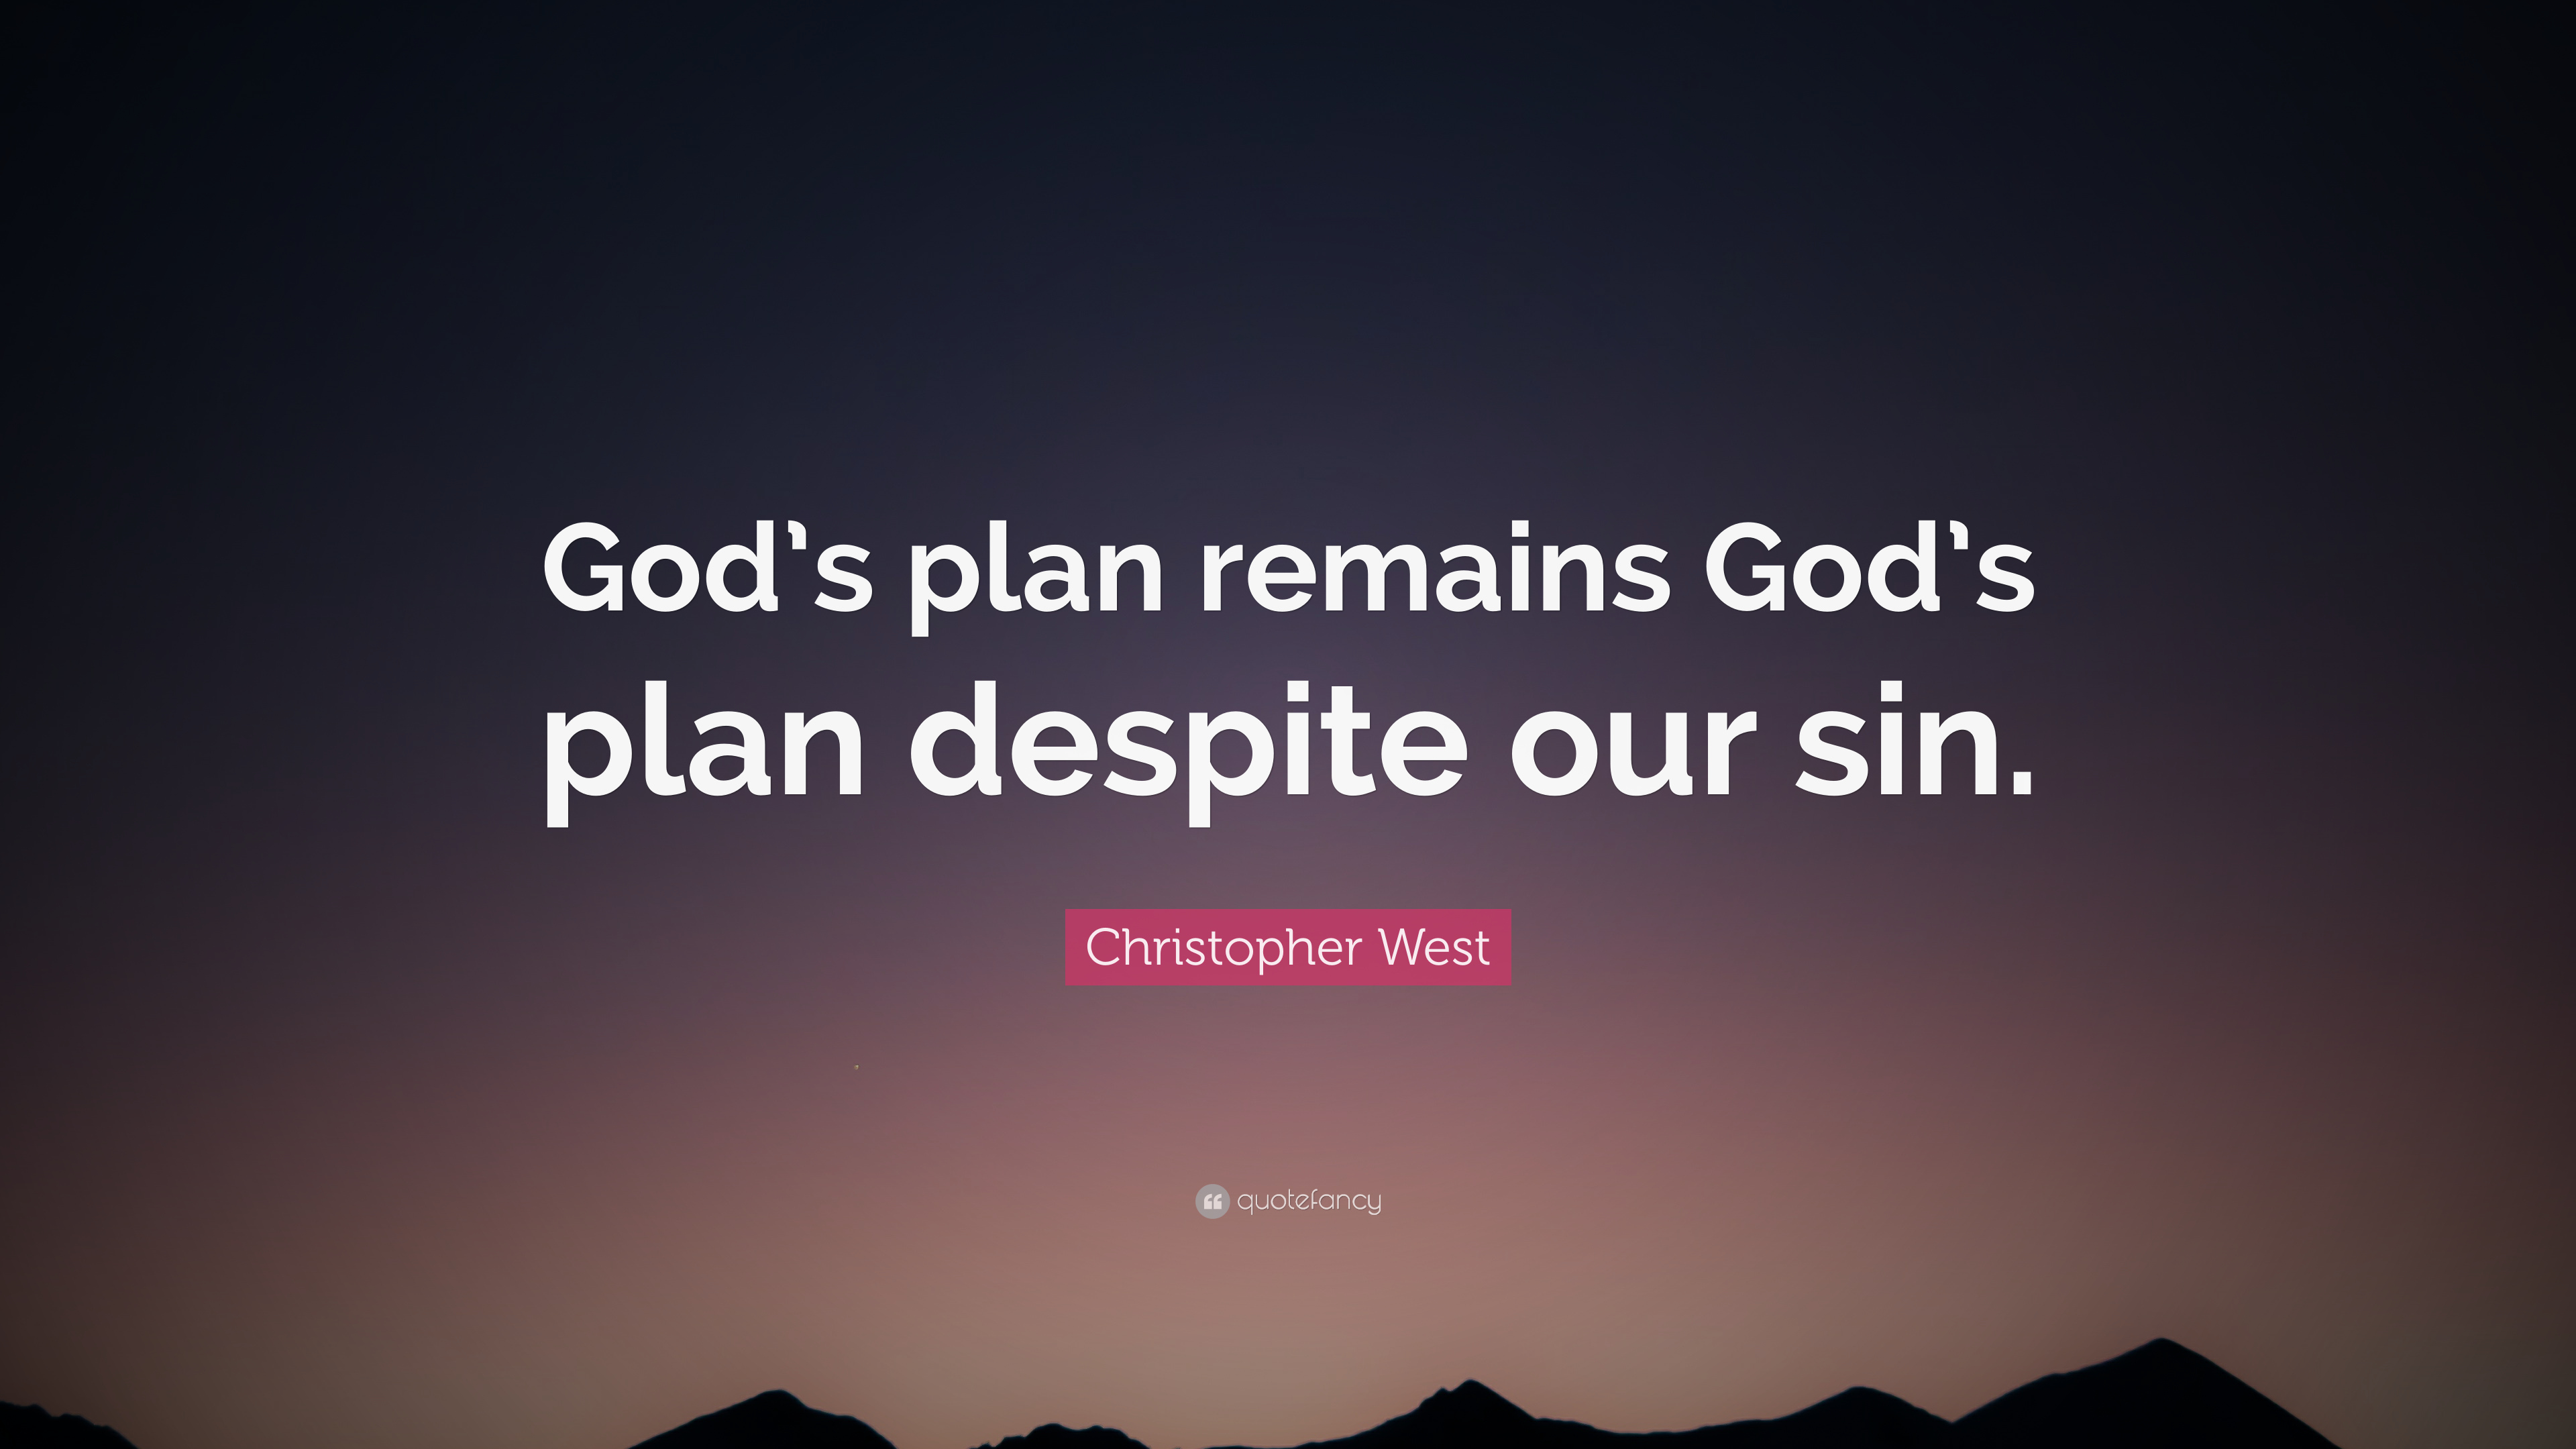 christopher west quotes quotefancy